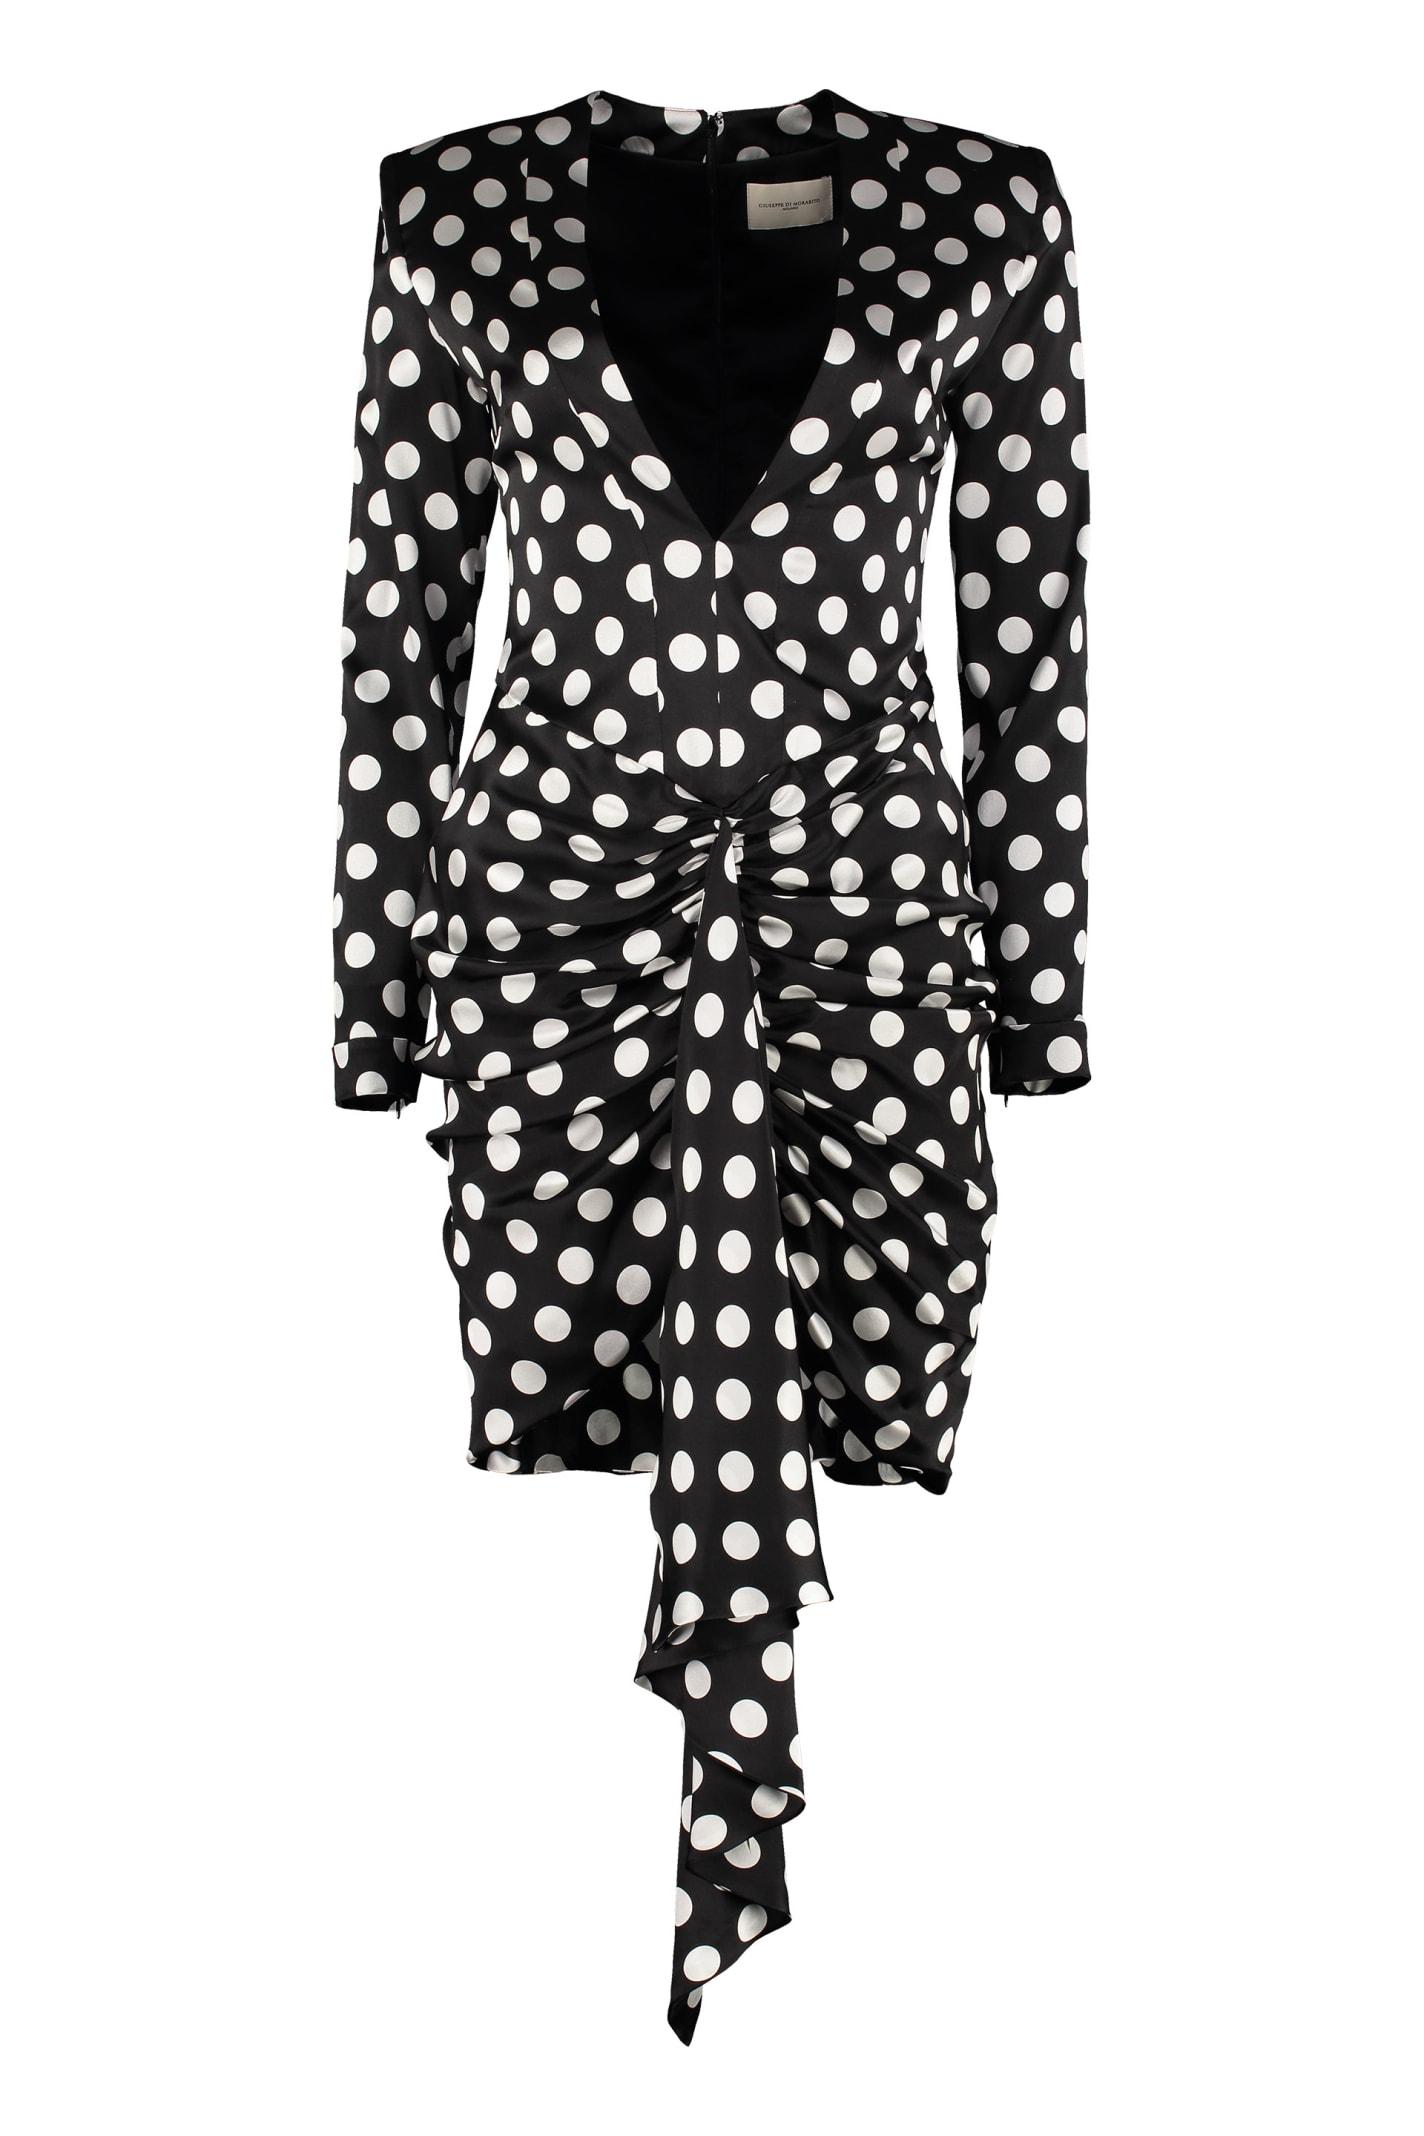 Buy Giuseppe di Morabito Polka-dot Print Silk Mini Dress online, shop Giuseppe di Morabito with free shipping